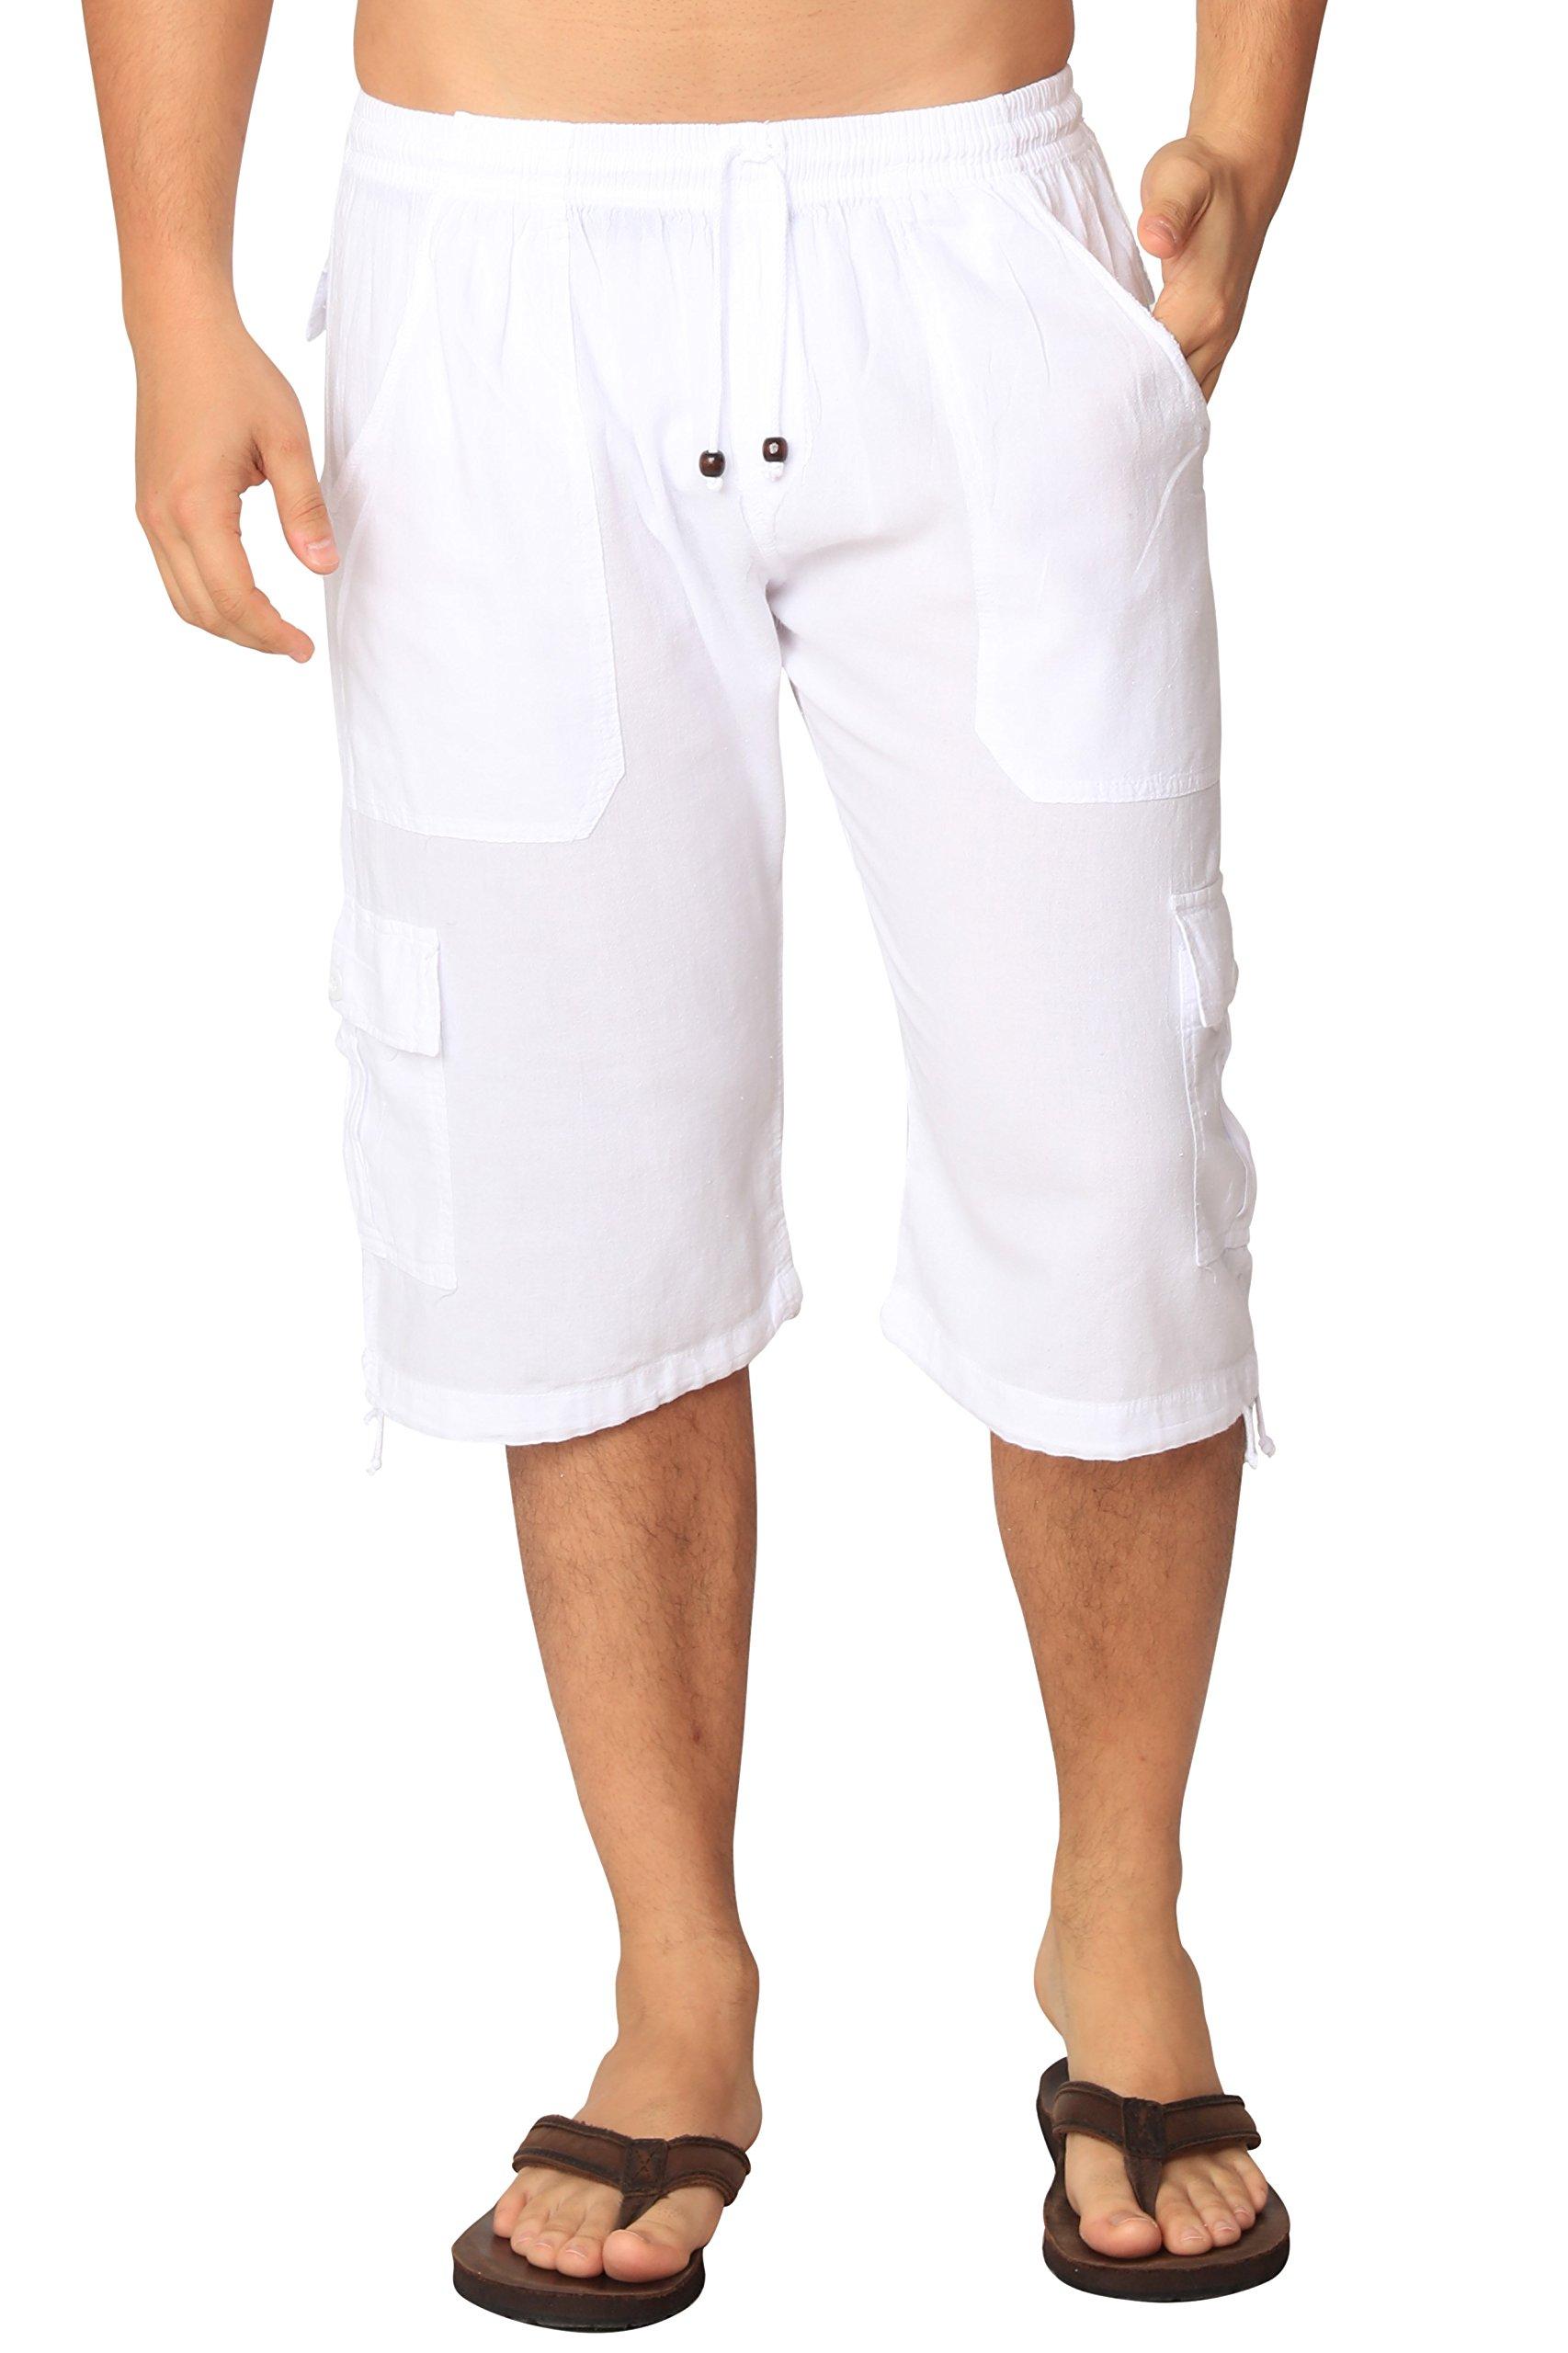 M&B USA Cotton White Loose Fit Summer Cargo Shorts Solid Multi-Pocket Casual Capri Elastic Waistband Pants (Large, White)